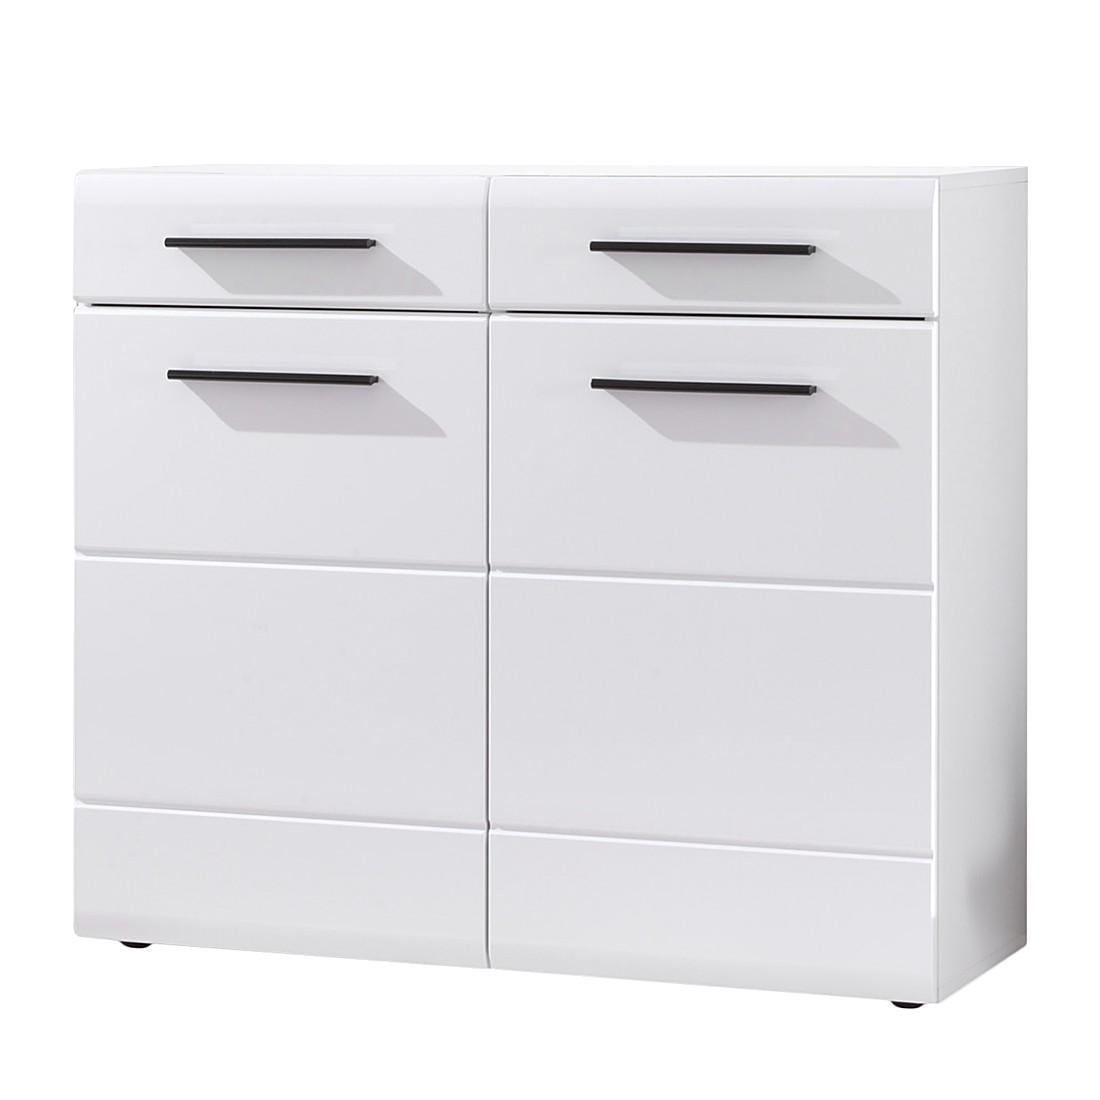 schuhschr nke online kaufen. Black Bedroom Furniture Sets. Home Design Ideas